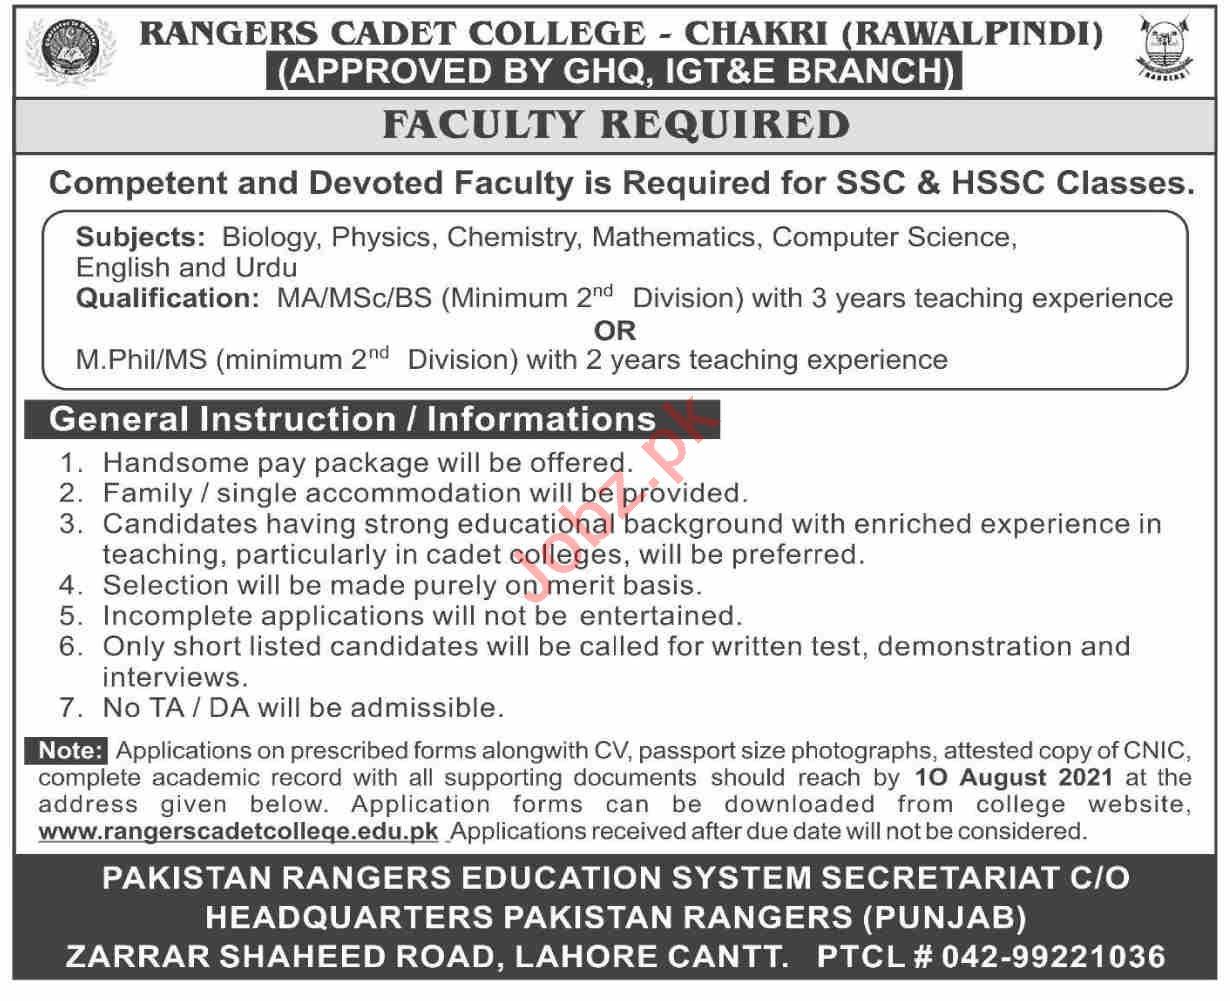 Rangers Cadet College Chakri Rawalpindi Jobs 2021 Lecturers